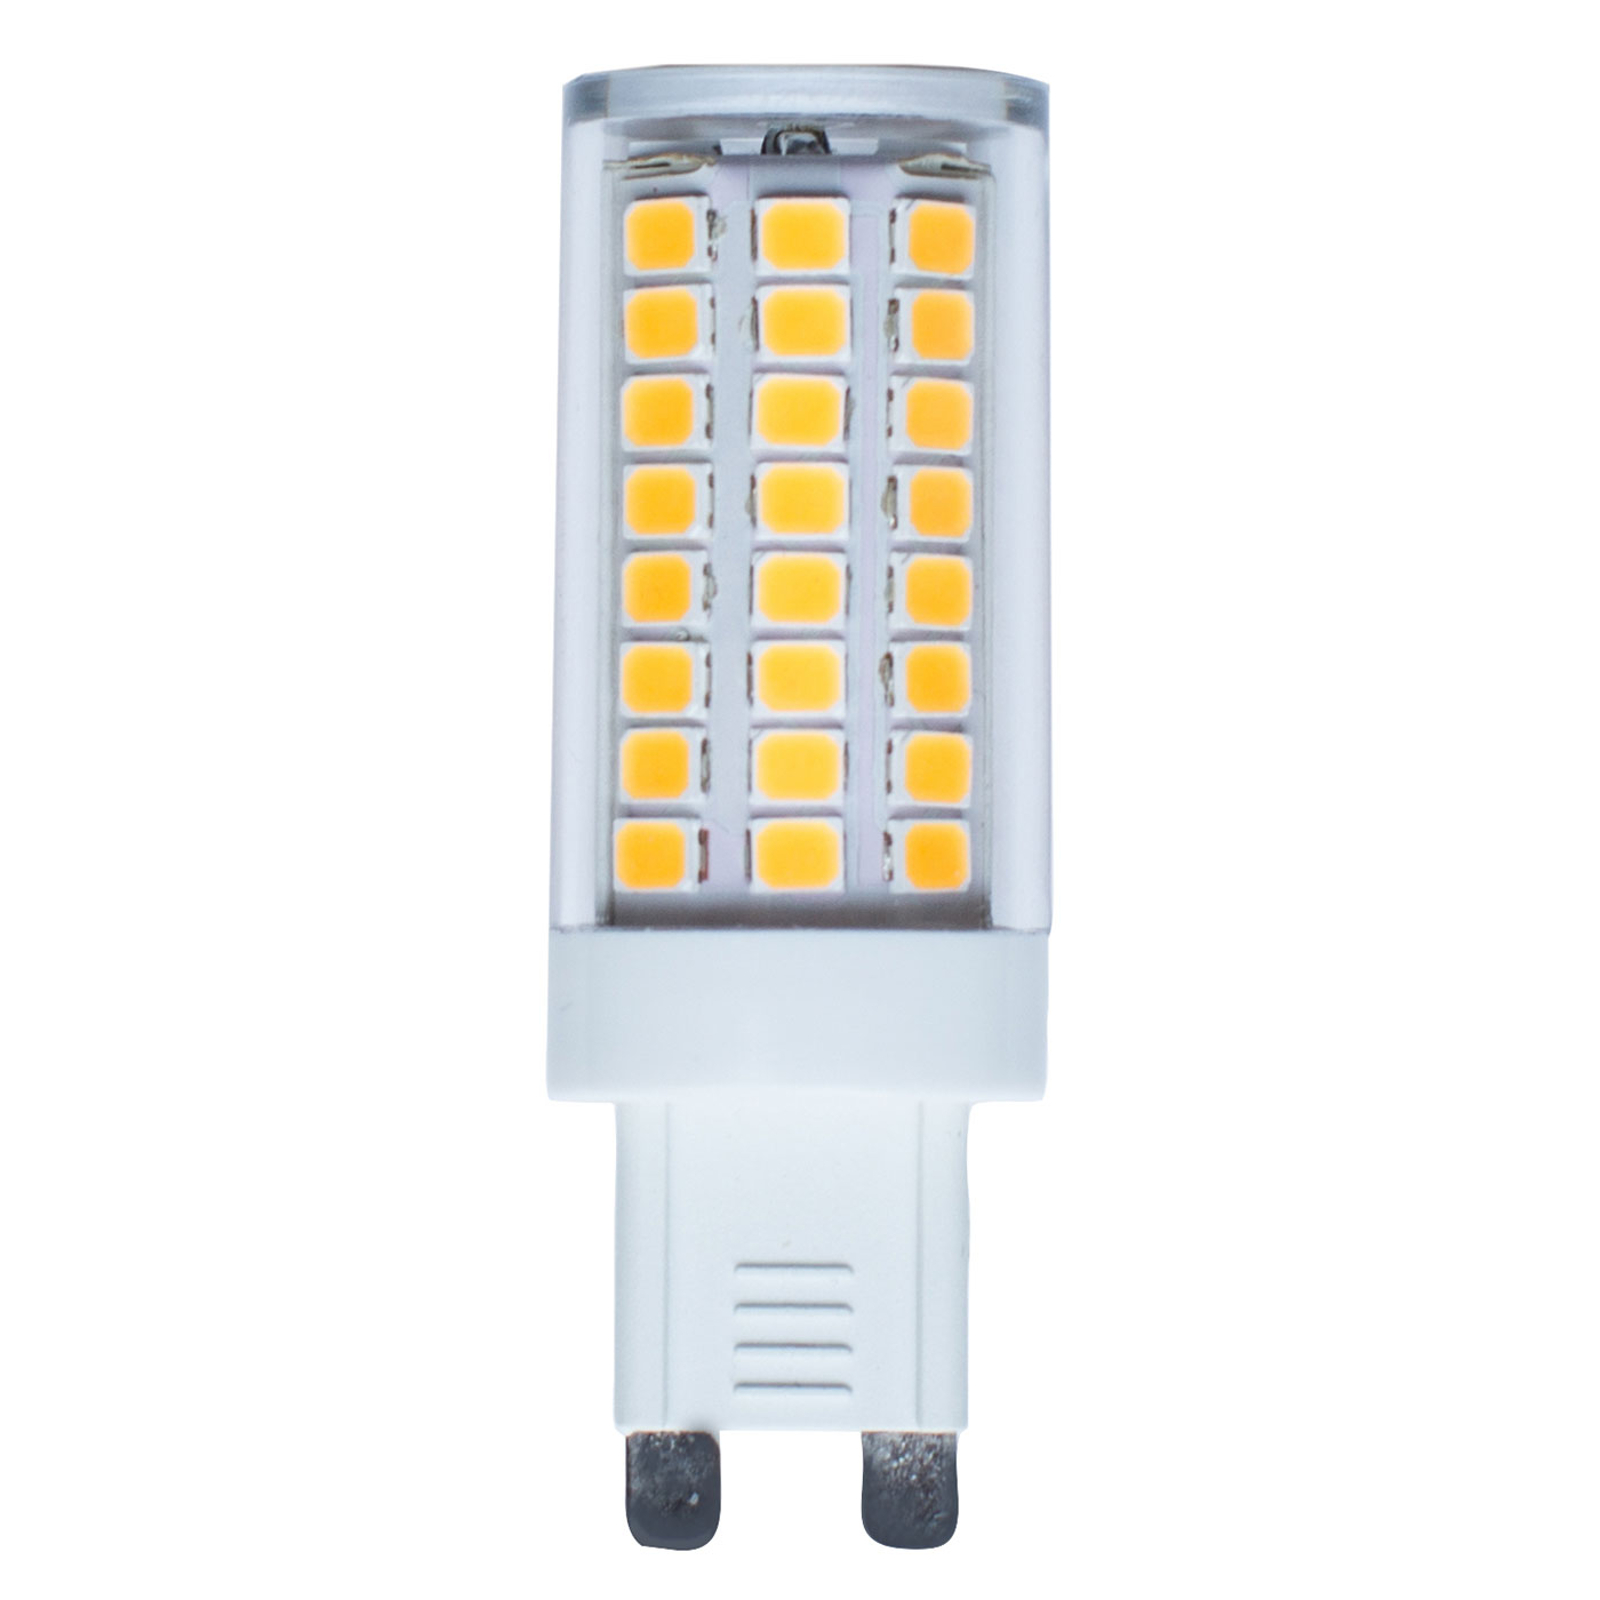 Żarówka sztyft LED G9 4,8W 2800 K 600lm